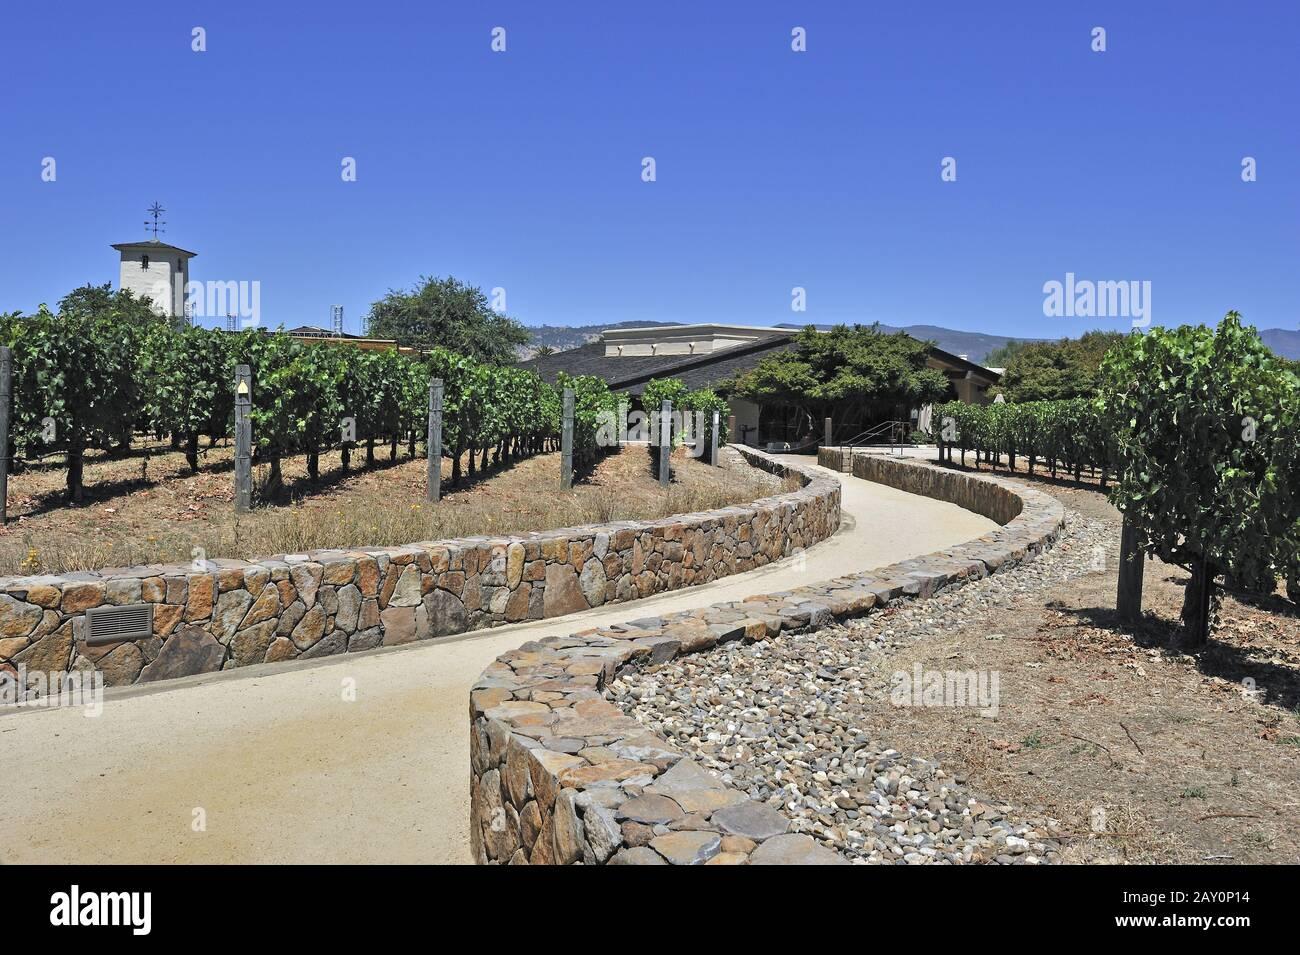 View of the vineyards of Robert Mondavi Winery, Napa Valley, Stock Photo